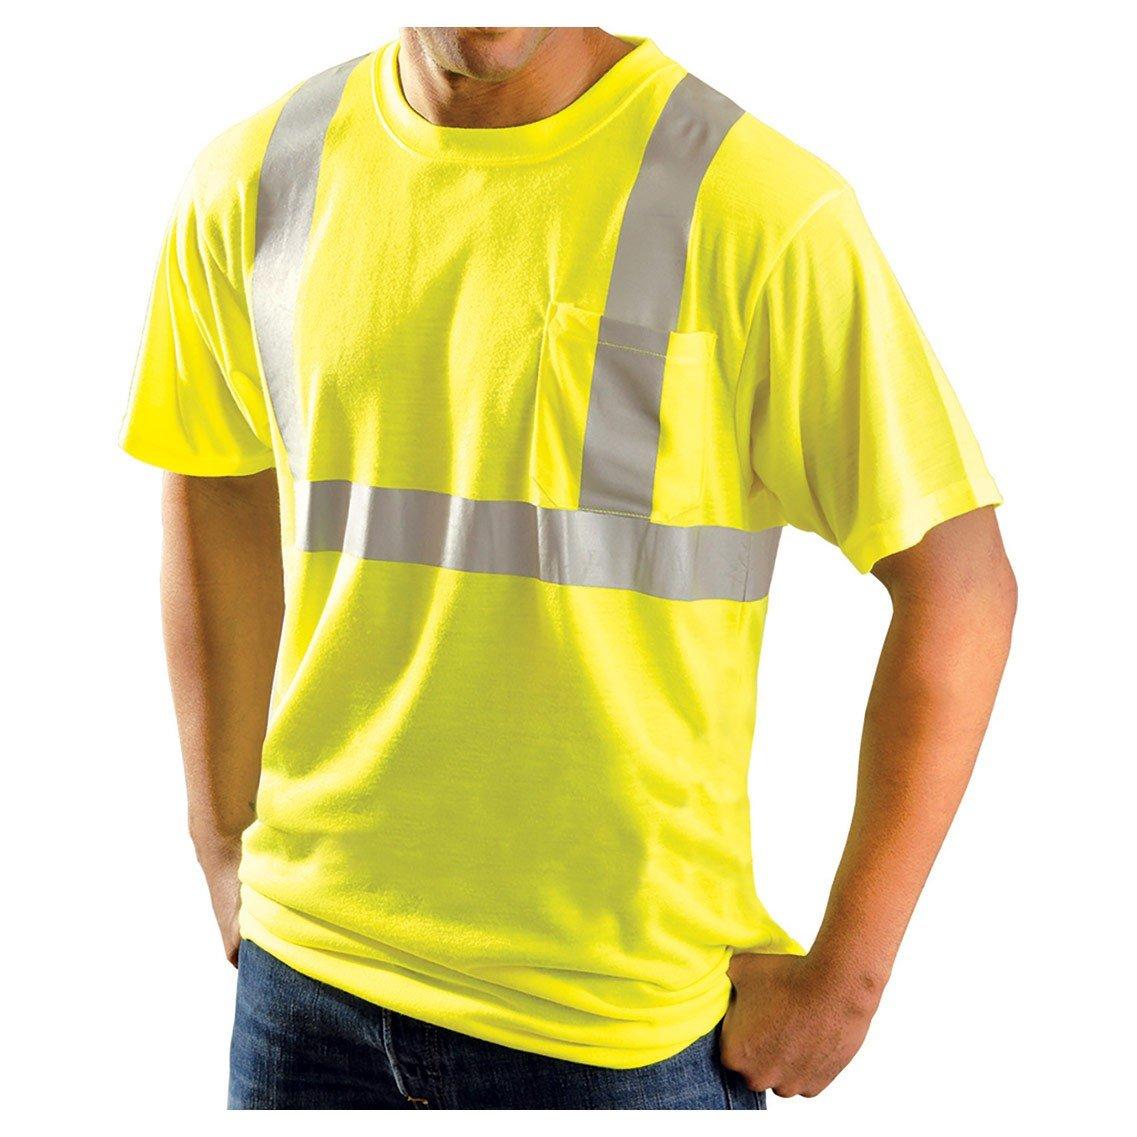 Rugged Blue クラス2 高い視認性 発散性 Tシャツ B01IPW53RY Small|蛍光イエロー (High-Vis Yellow) 蛍光イエロー (High-Vis Yellow) Small